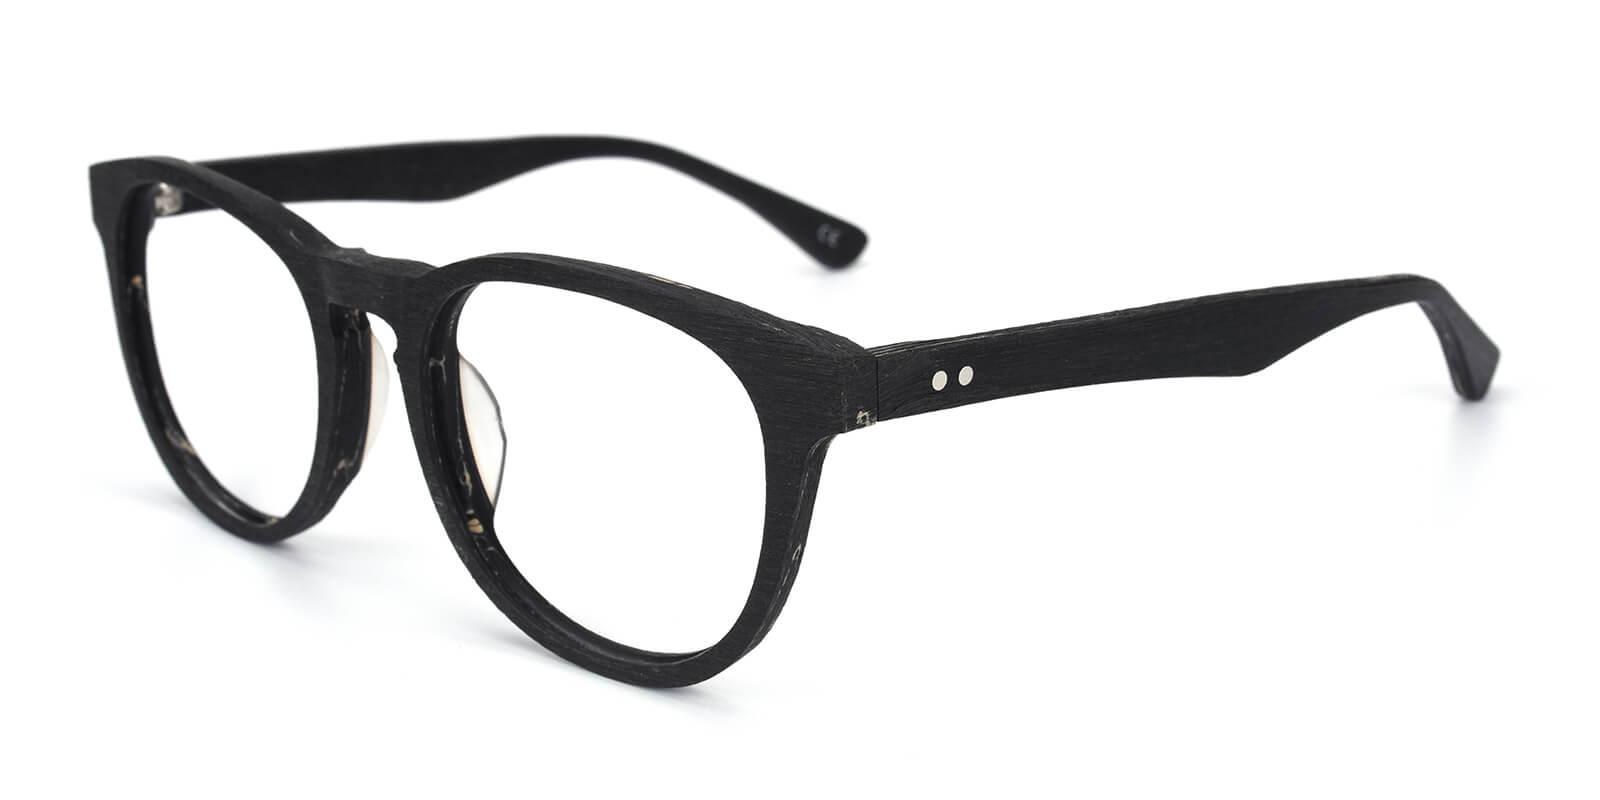 Rechela-Black-Round-Acetate-Eyeglasses-additional1